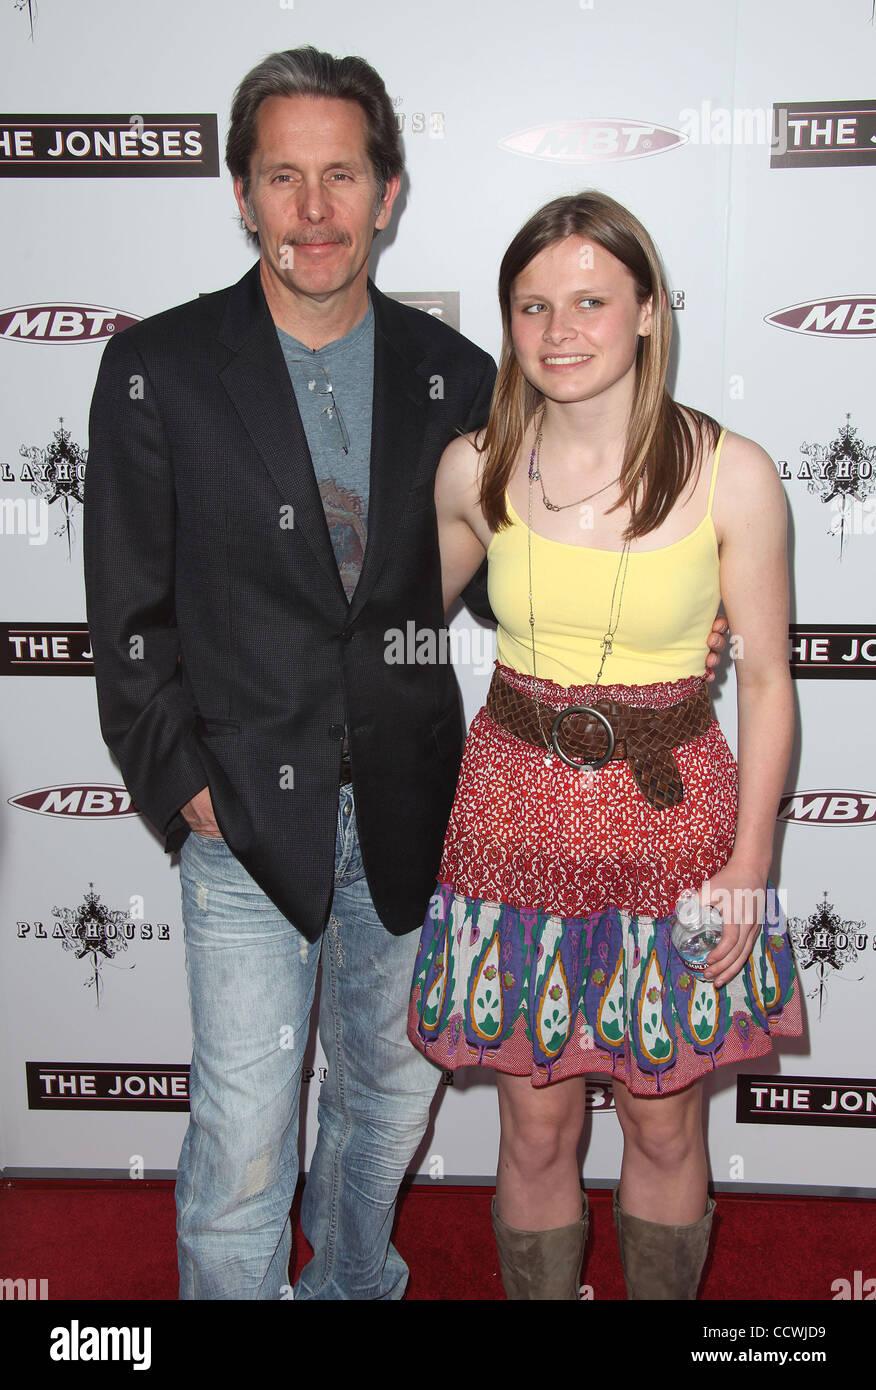 apr 8 2010 hollywood california usa actor gary cole